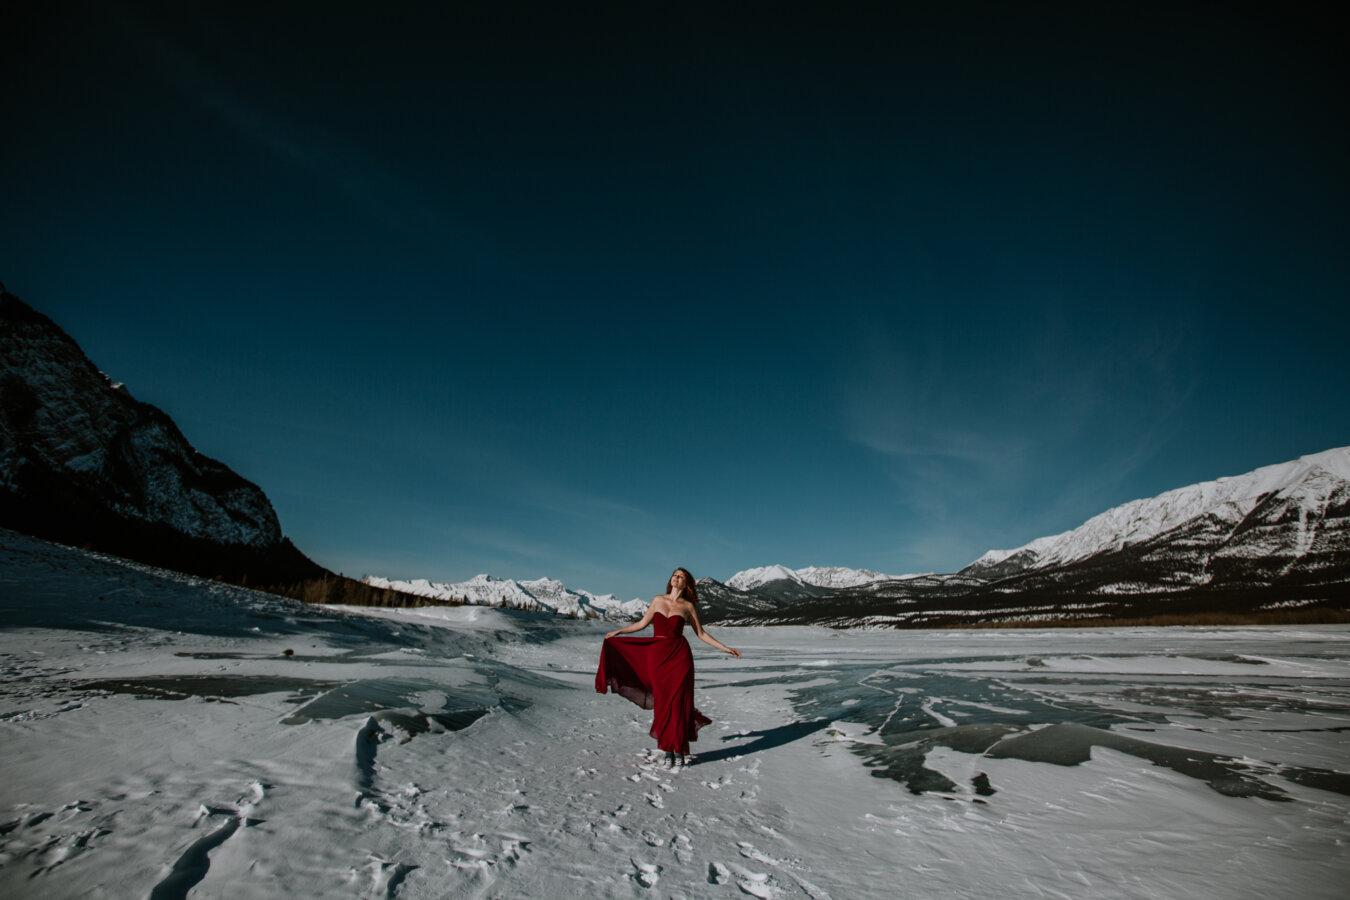 Dane Halo Banff Portrait Photography | Calgary Best Photographers | Modeling Portfolio Photos | Destination Photographer